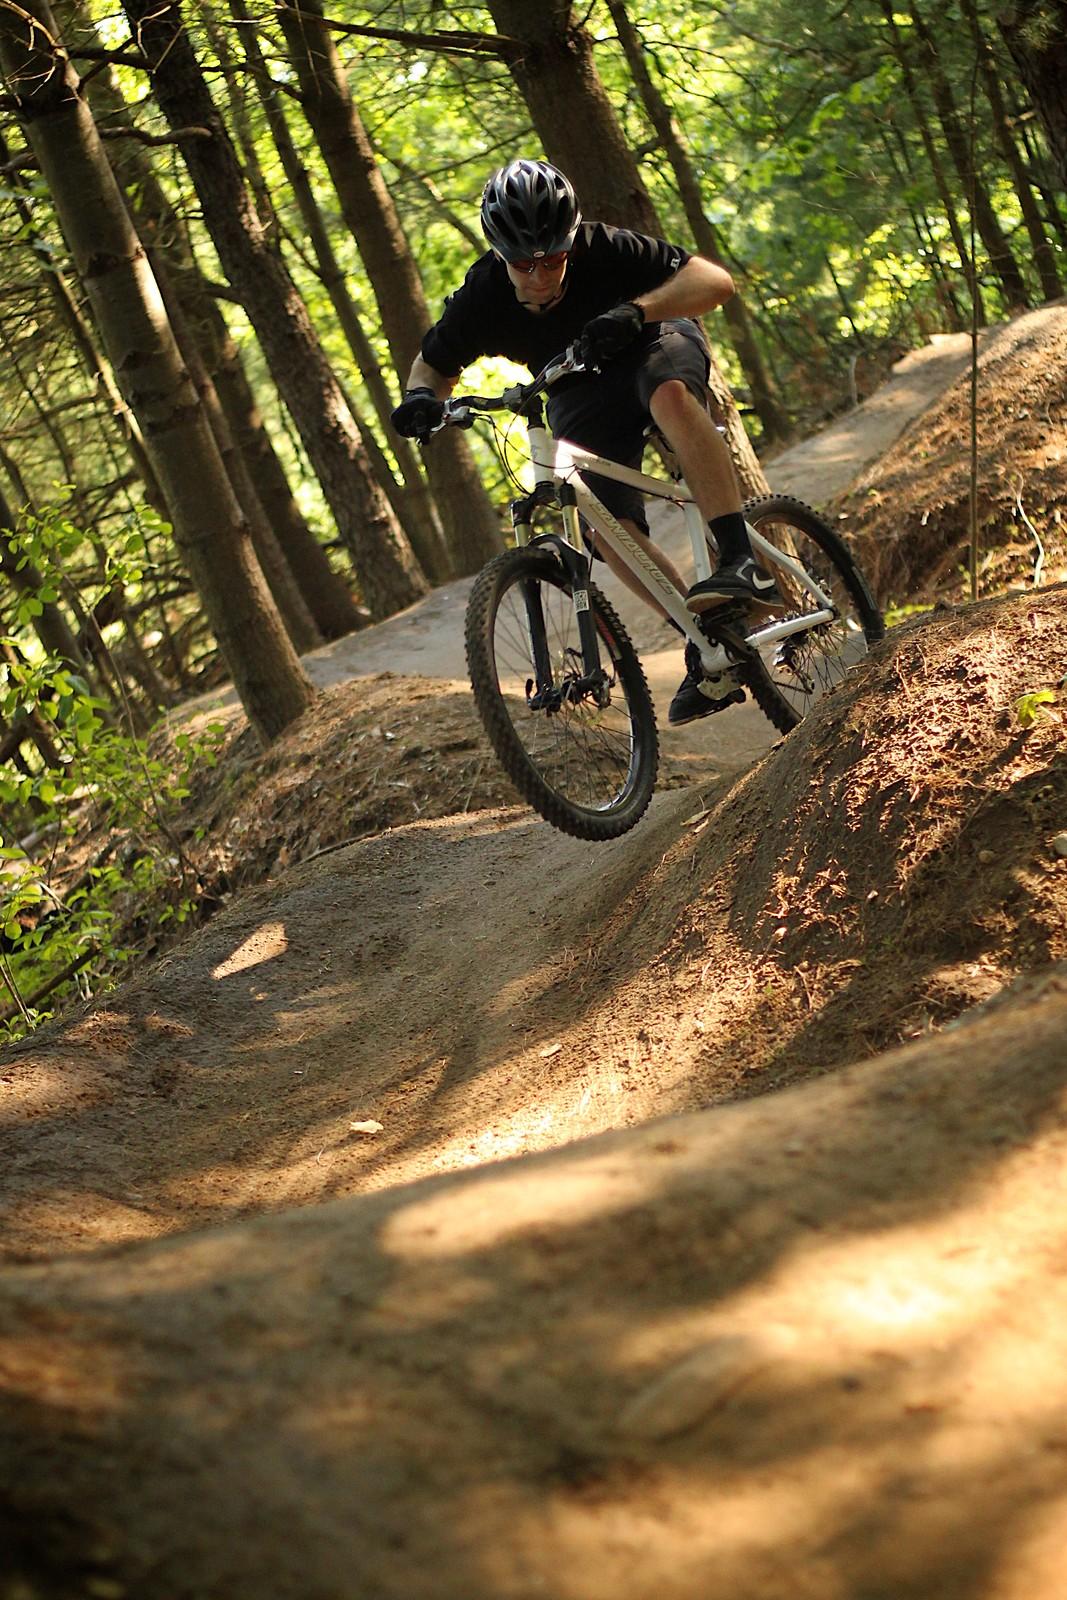 IMG_5001 - currans - Mountain Biking Pictures - Vital MTB